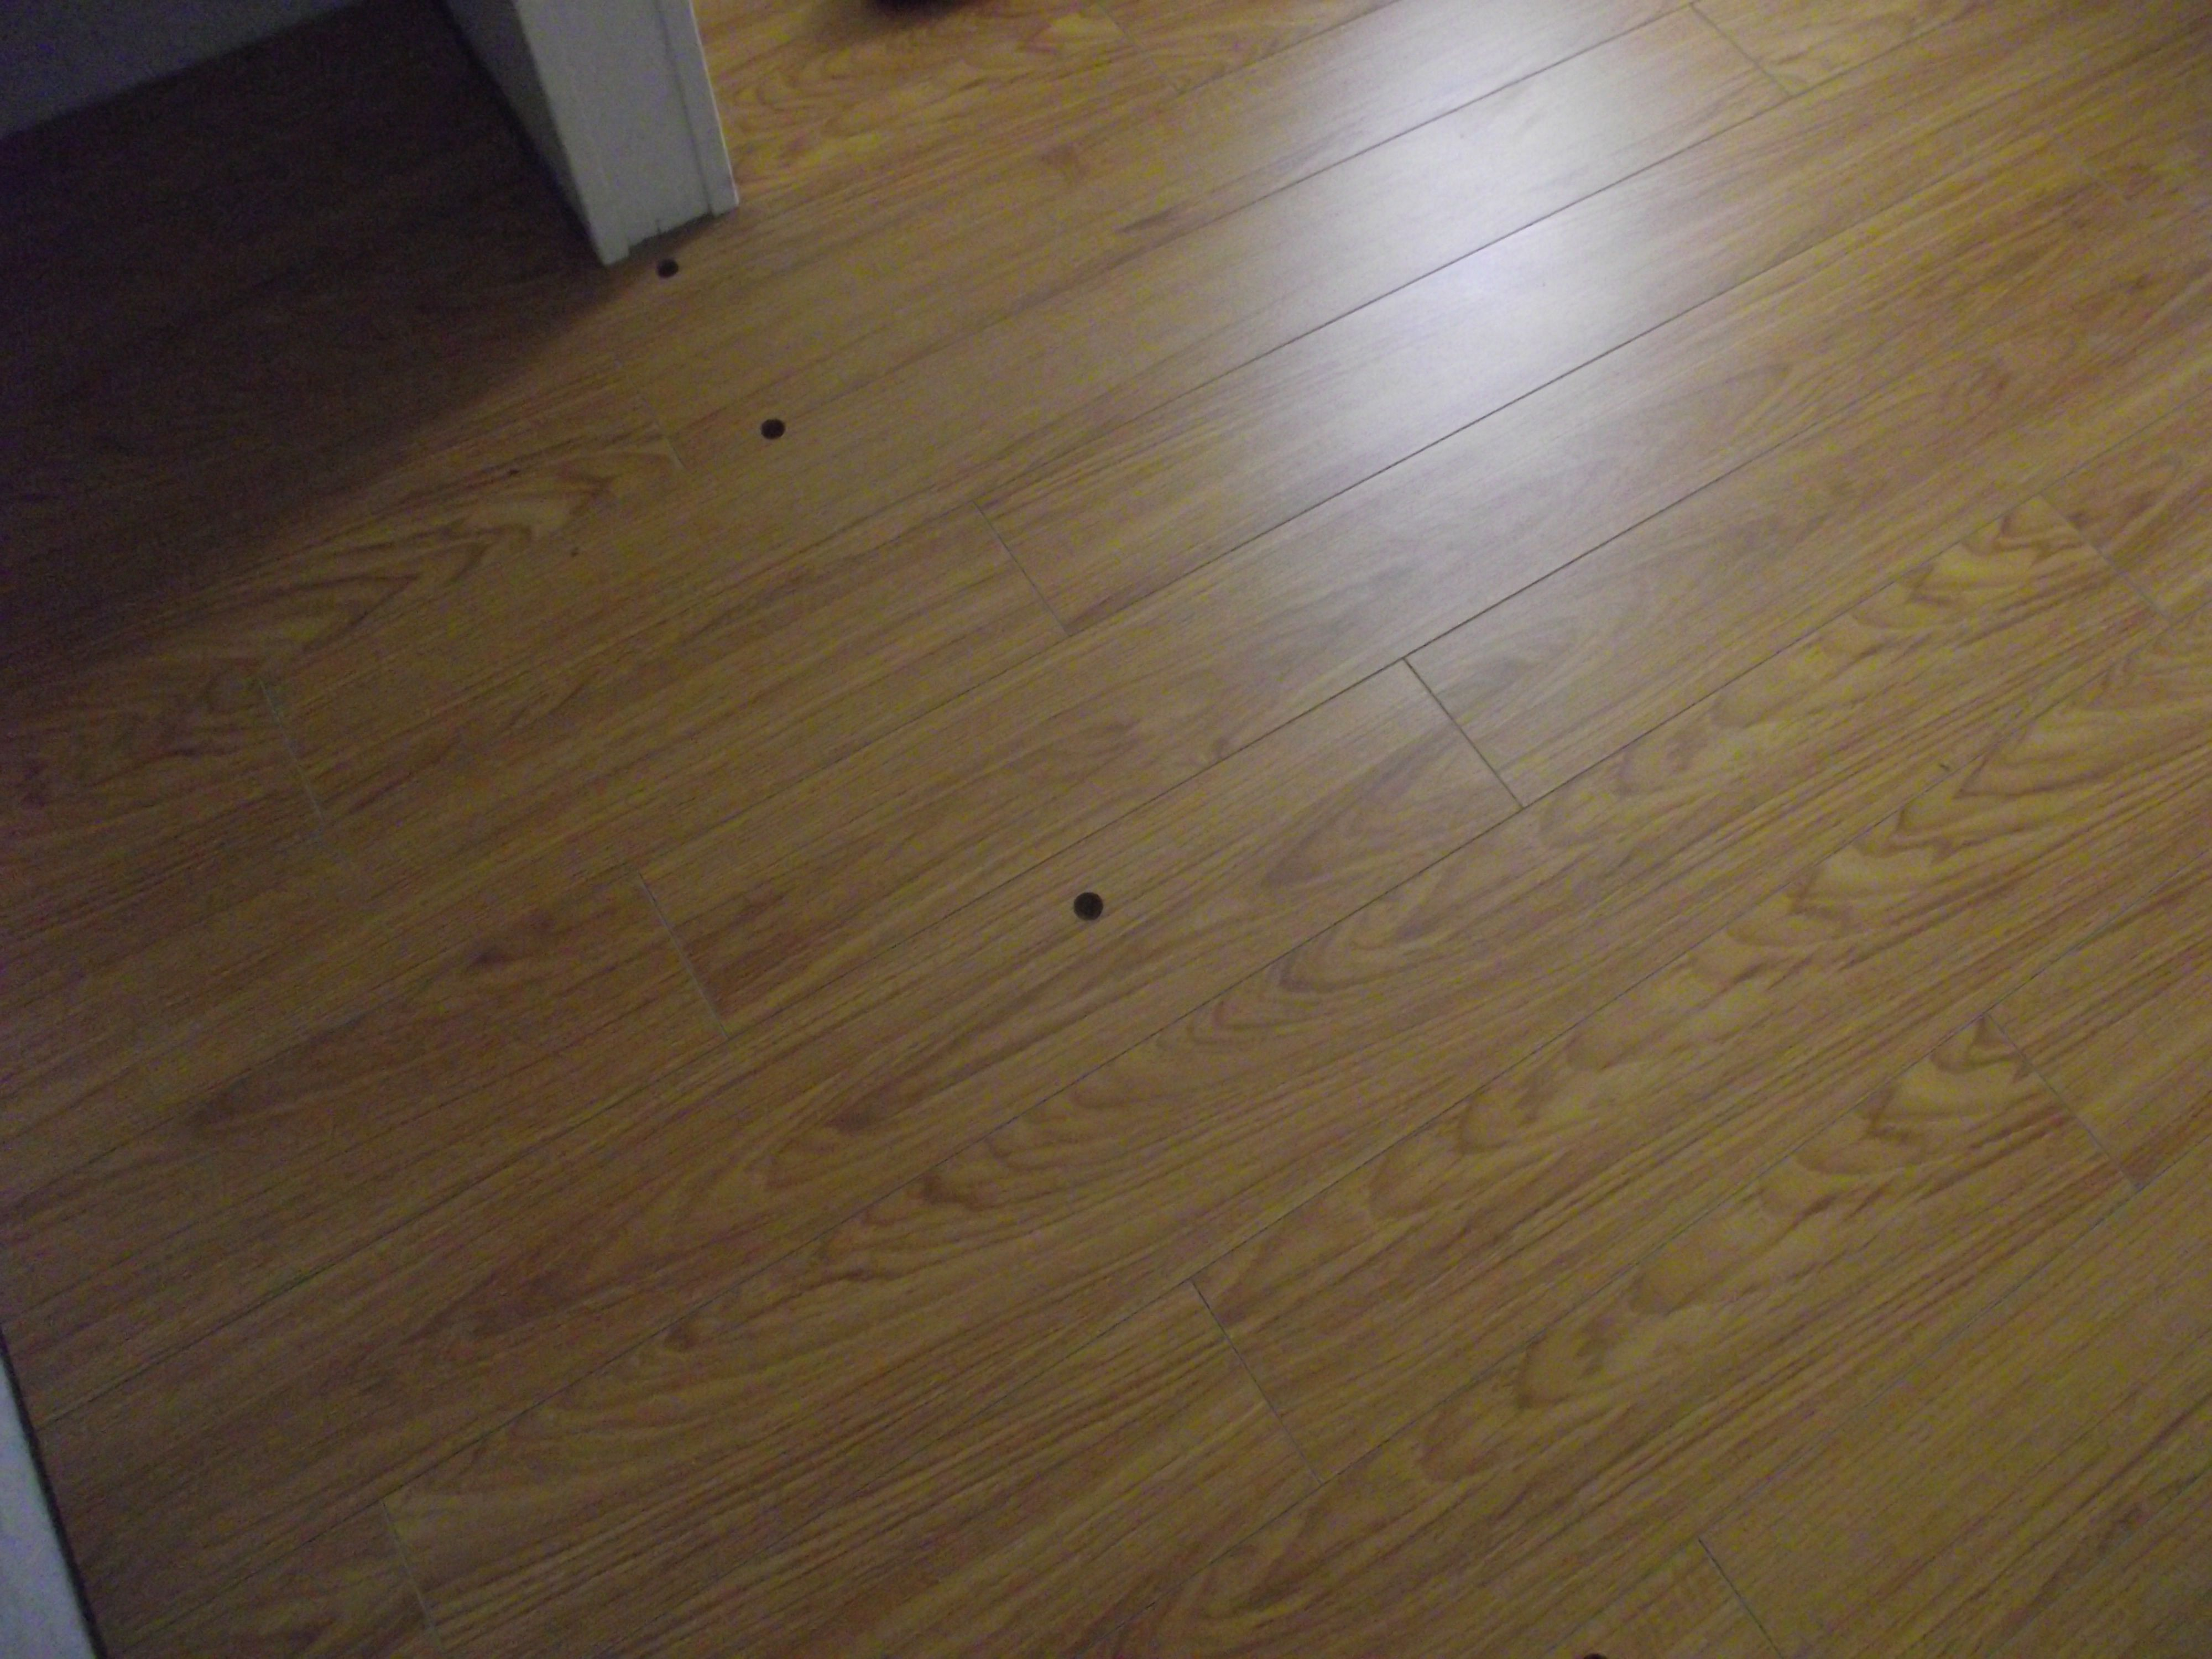 Installing Laminate Flooring In Mobile Homes Installing Laminate Flooring Laminate Flooring Flooring